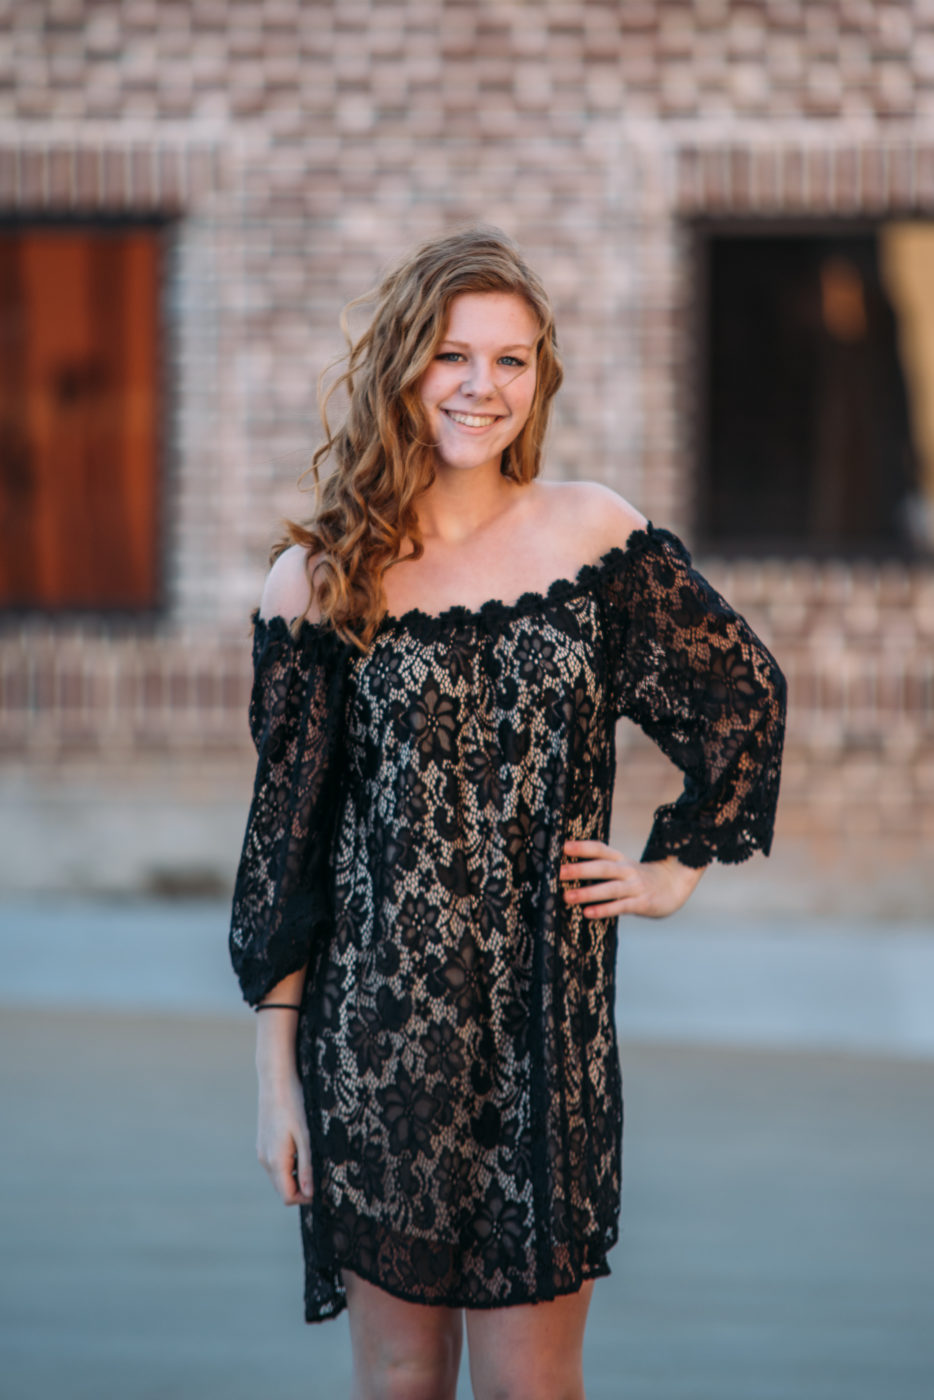 Enchandress's Spell Lace Dress